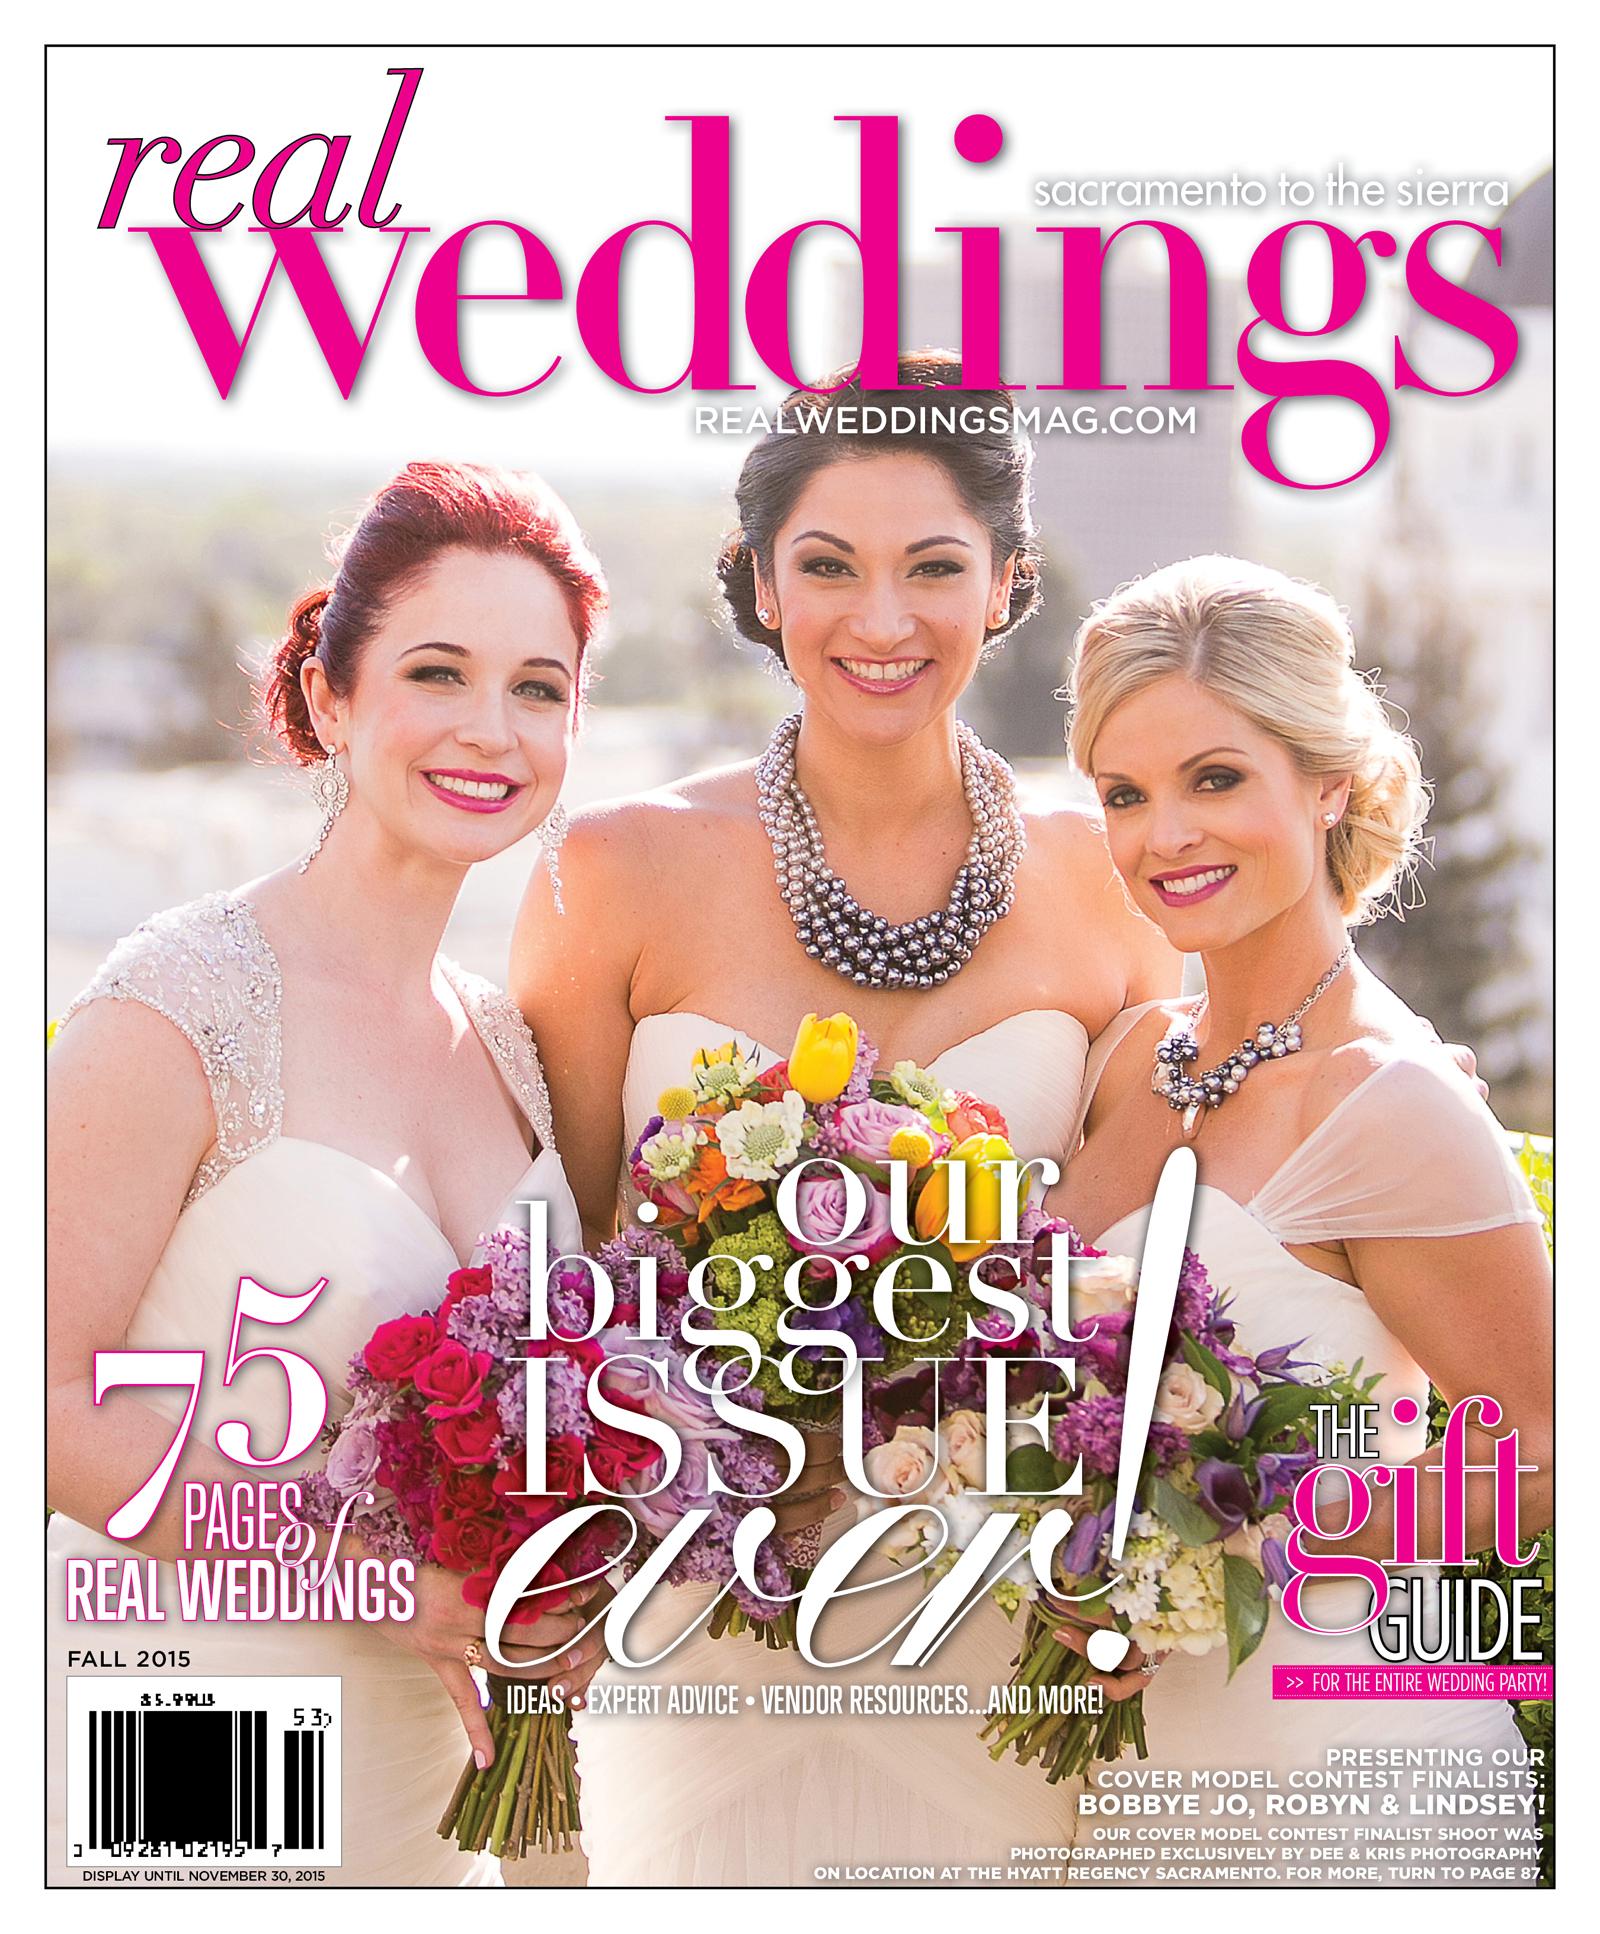 REAL-WEDDINGS-MAGAZINE-SACRAMENT0-TAHOE-BEST-VENDORS-TIPS-INSPIRATION-DEE-KRIS-HYATT